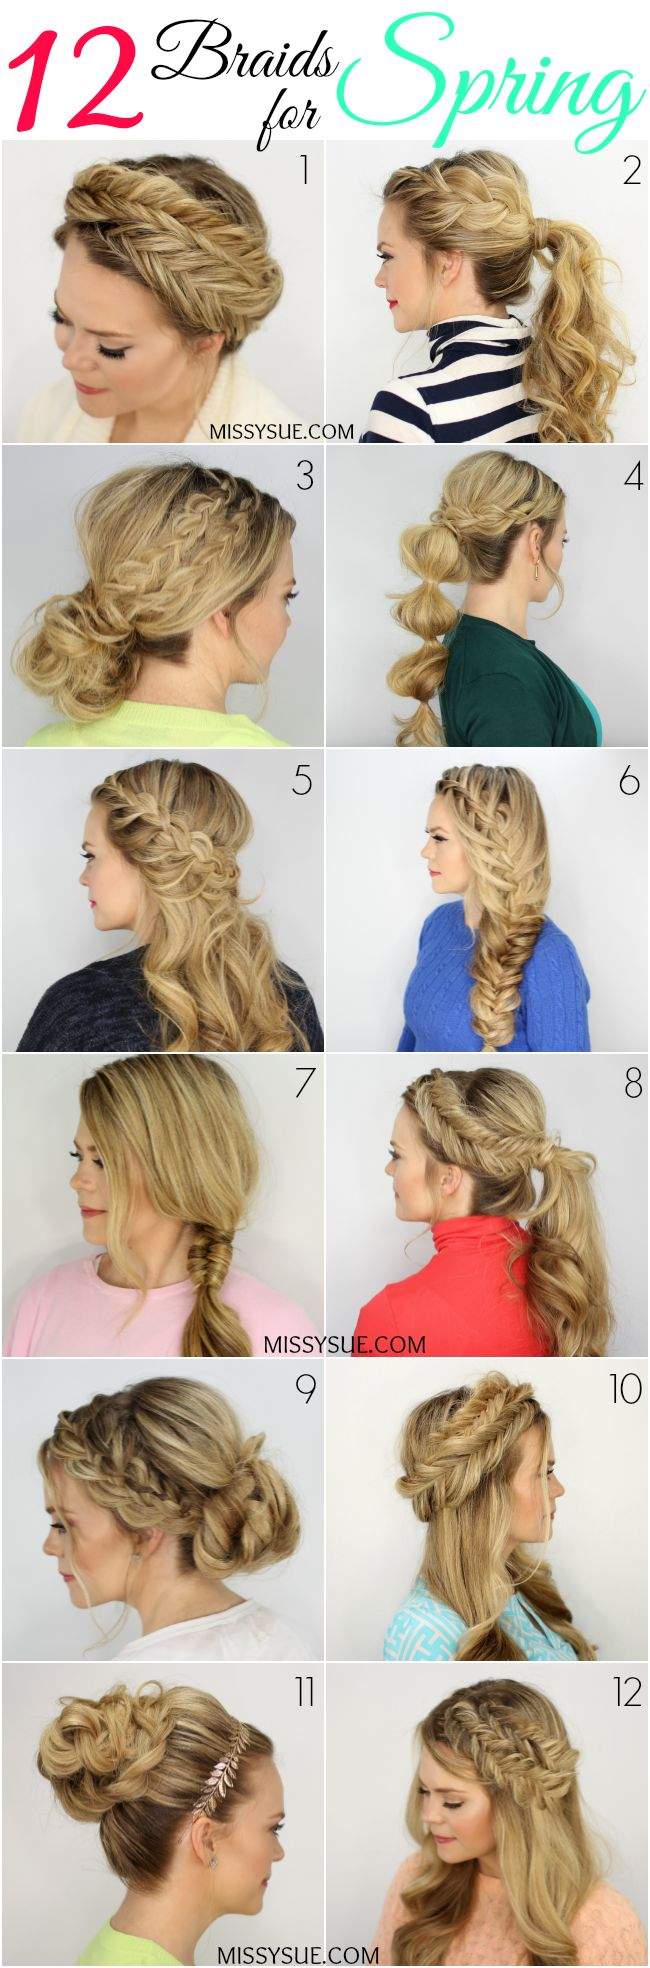 12 Braids for Spring